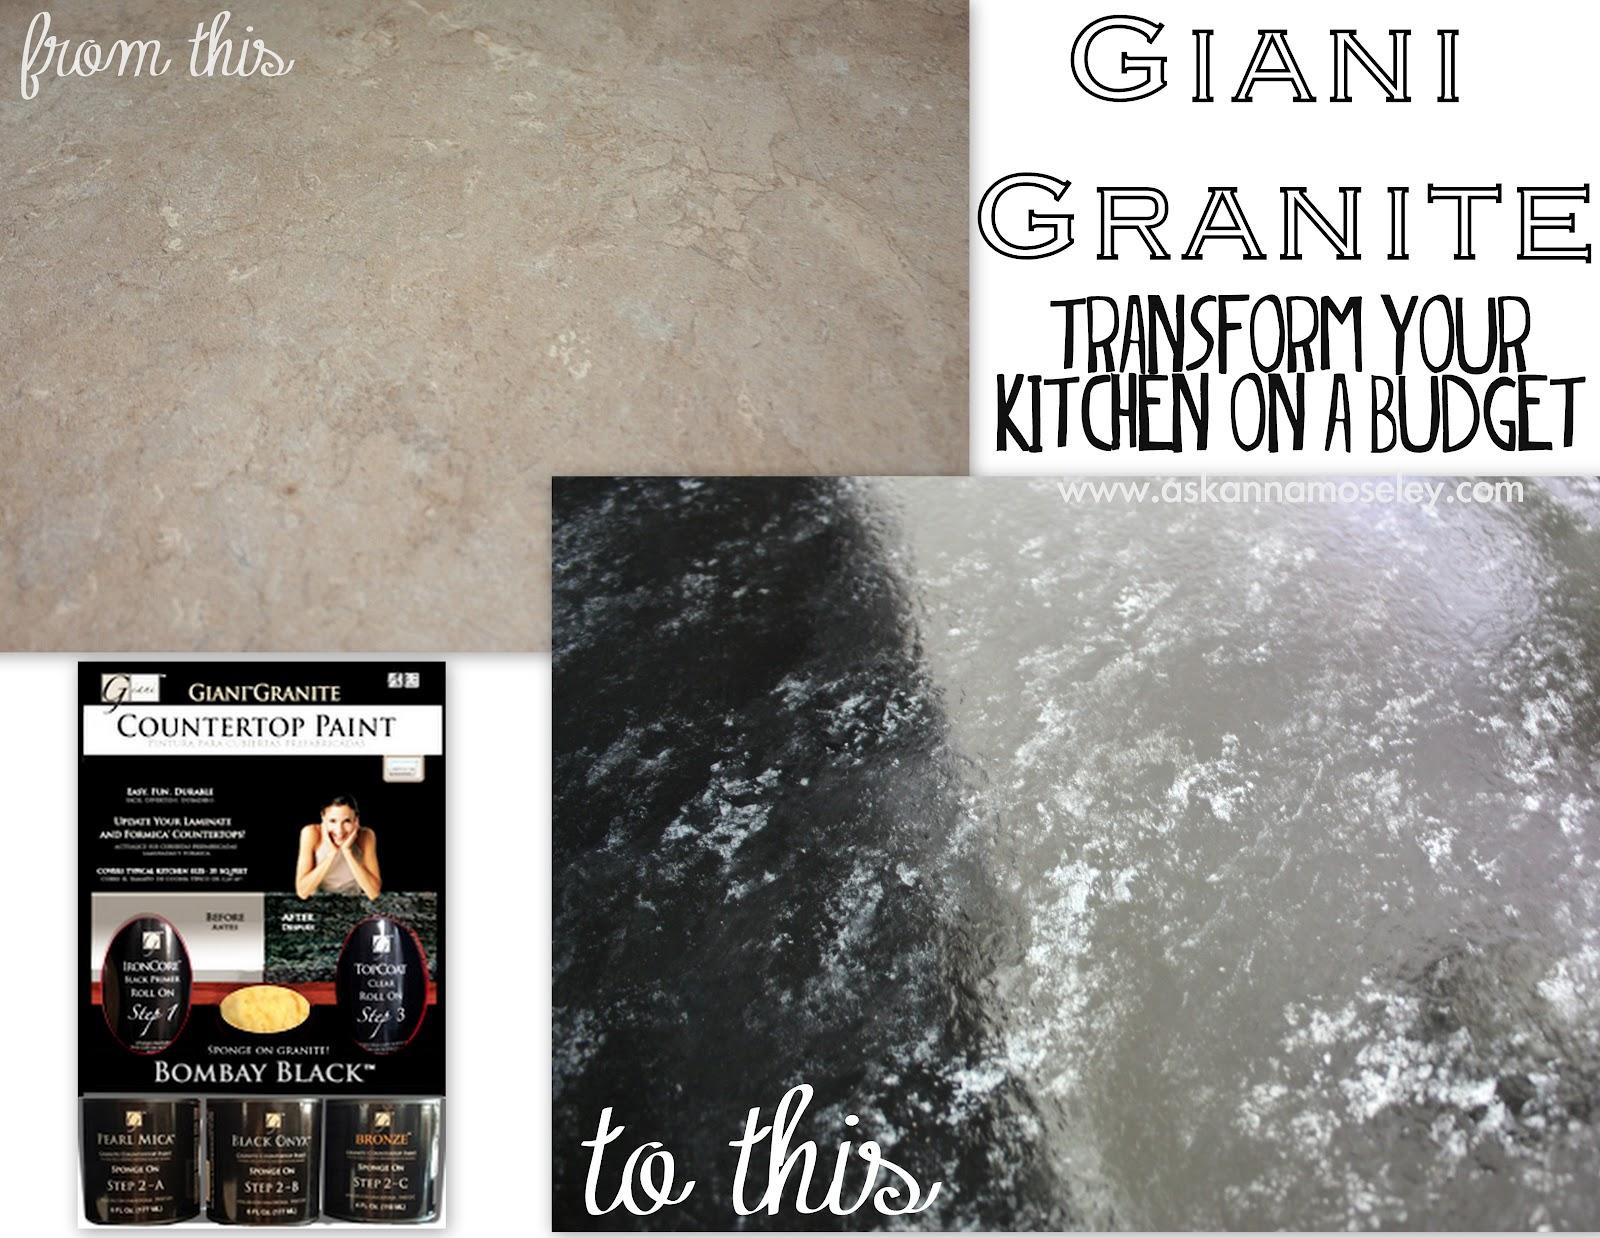 Giani Granite Countertop Paint Review Ask Anna - Kitchen countertop paint kits